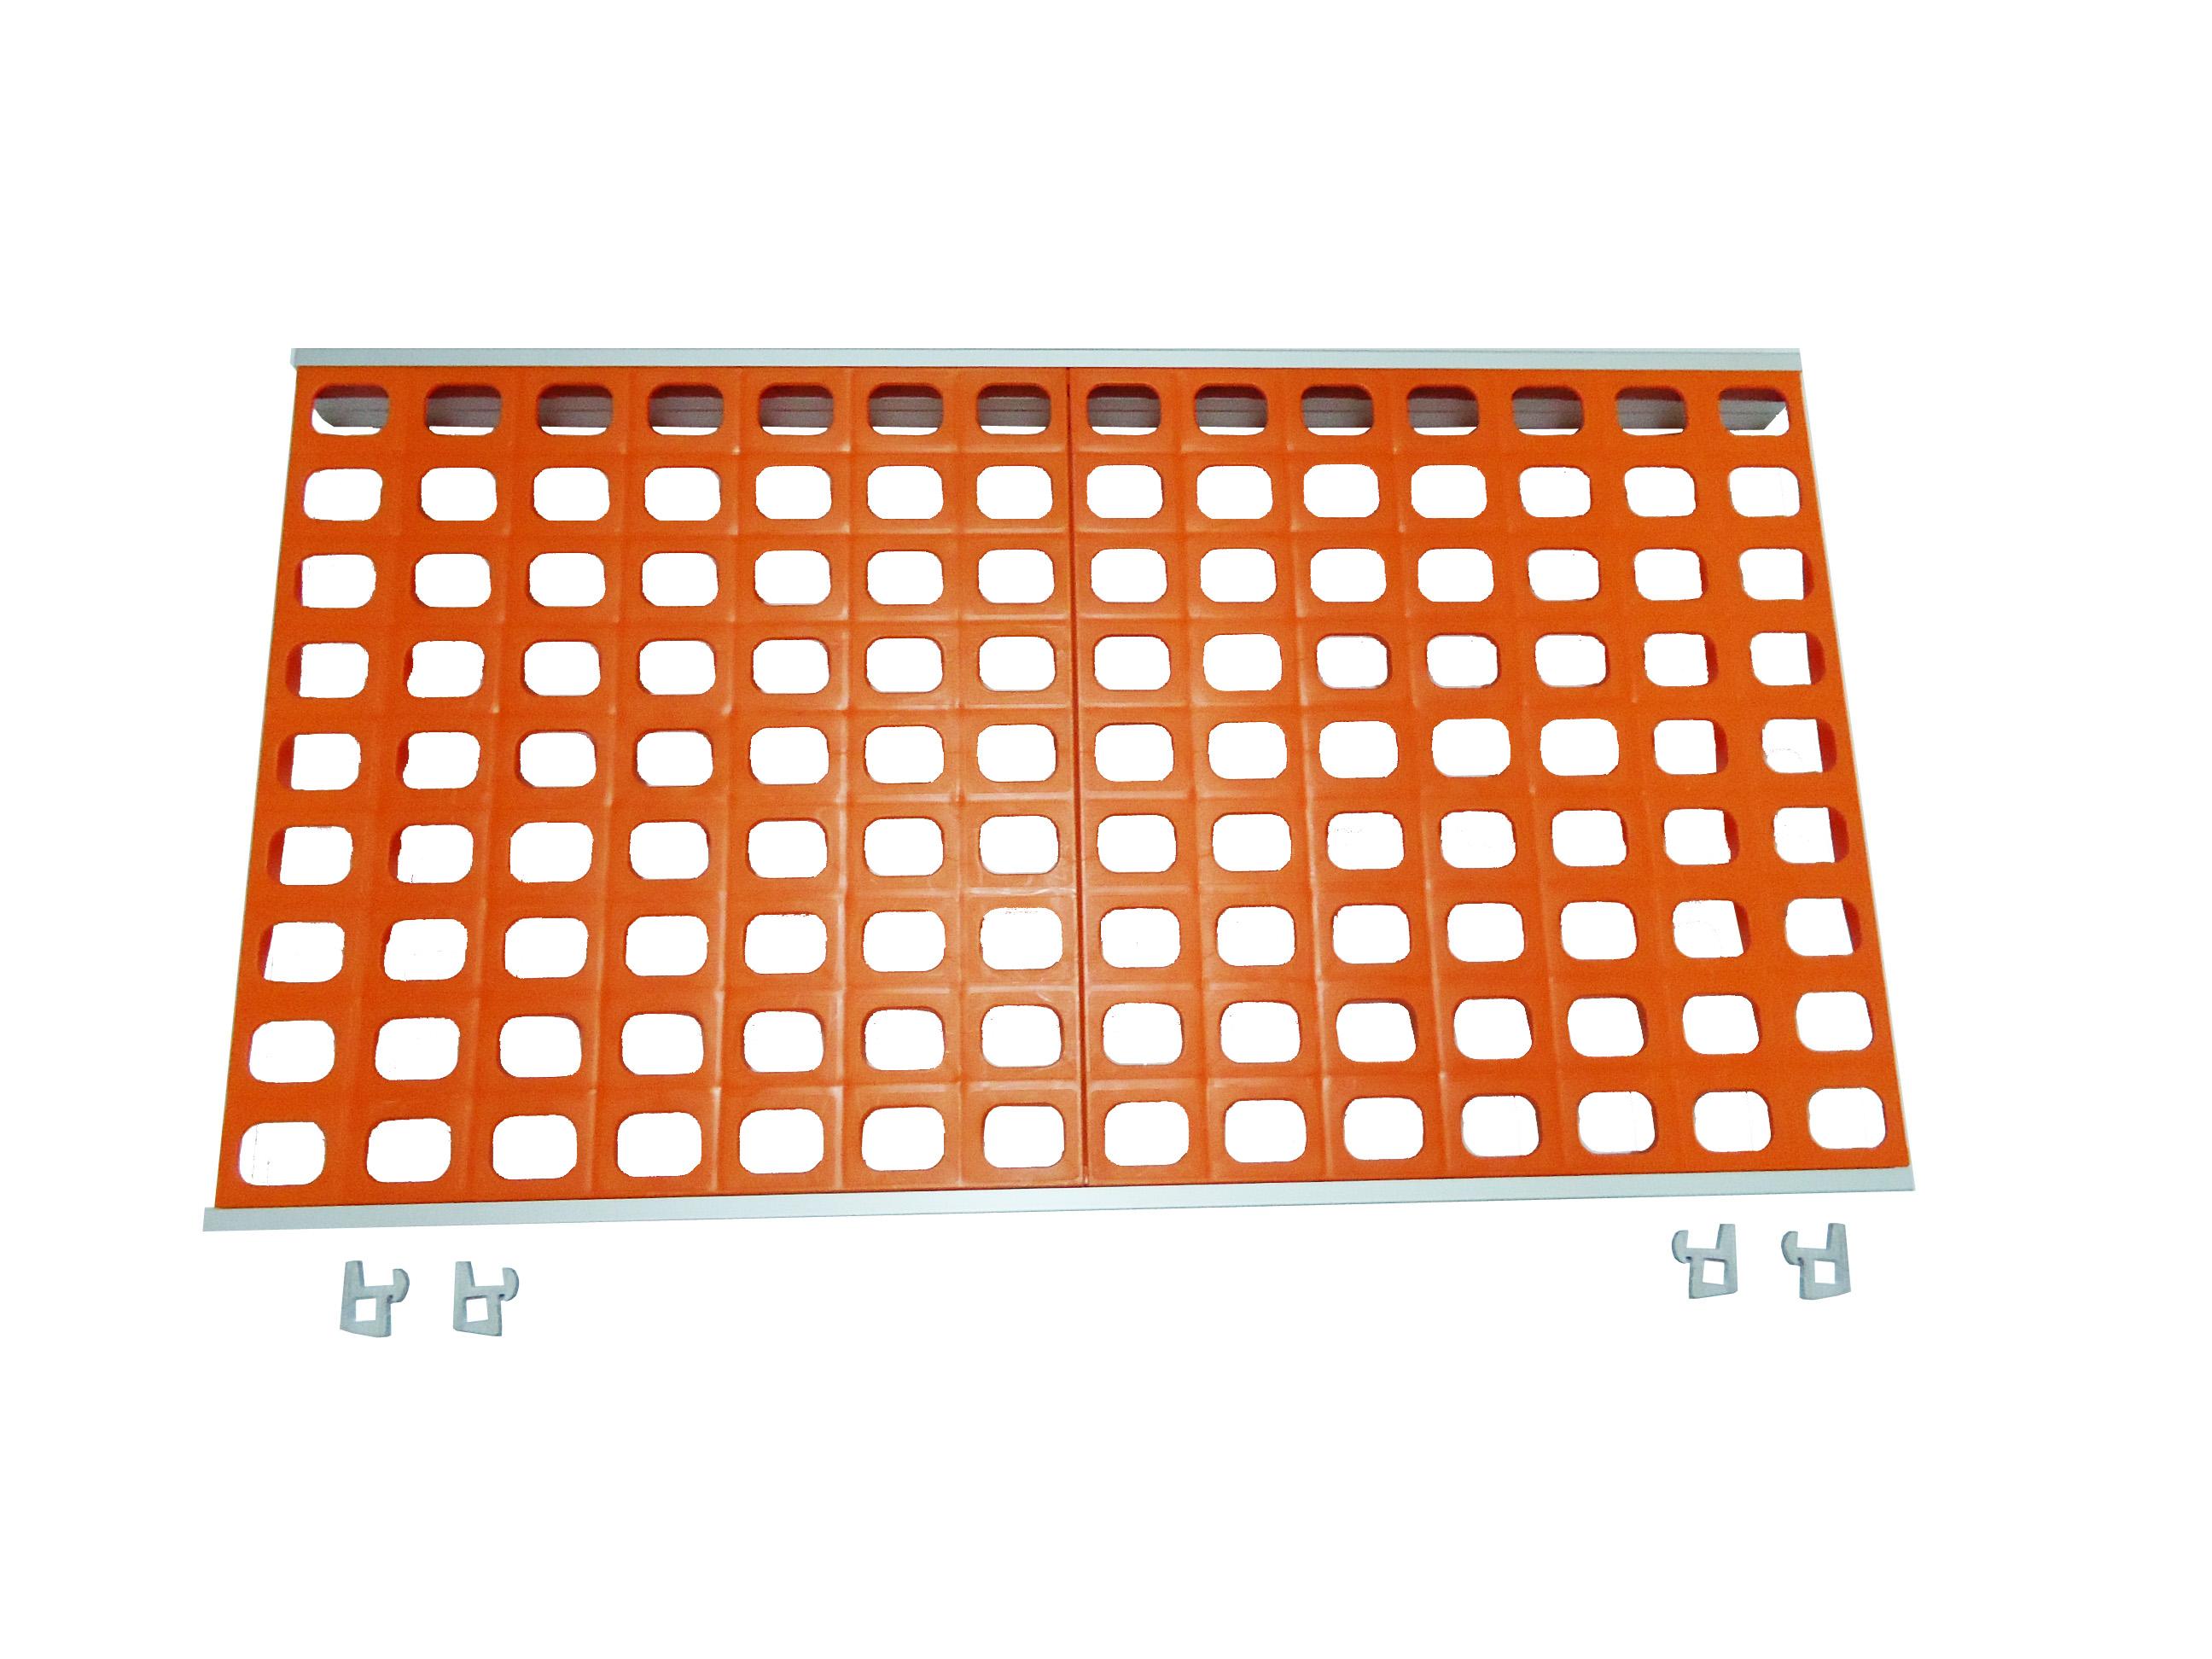 Coolblok KOPA47160C Ραφιέρα - Ράφι Ψυκτικών Θαλάμων Μονό Πολυαιθυλενίου - 1600x4 ψυκτικοί θάλαμοι    ράφια ψυκτικών θαλάμων  ψυκτικοί θάλαμοι    ράφια ψυκτικών θ